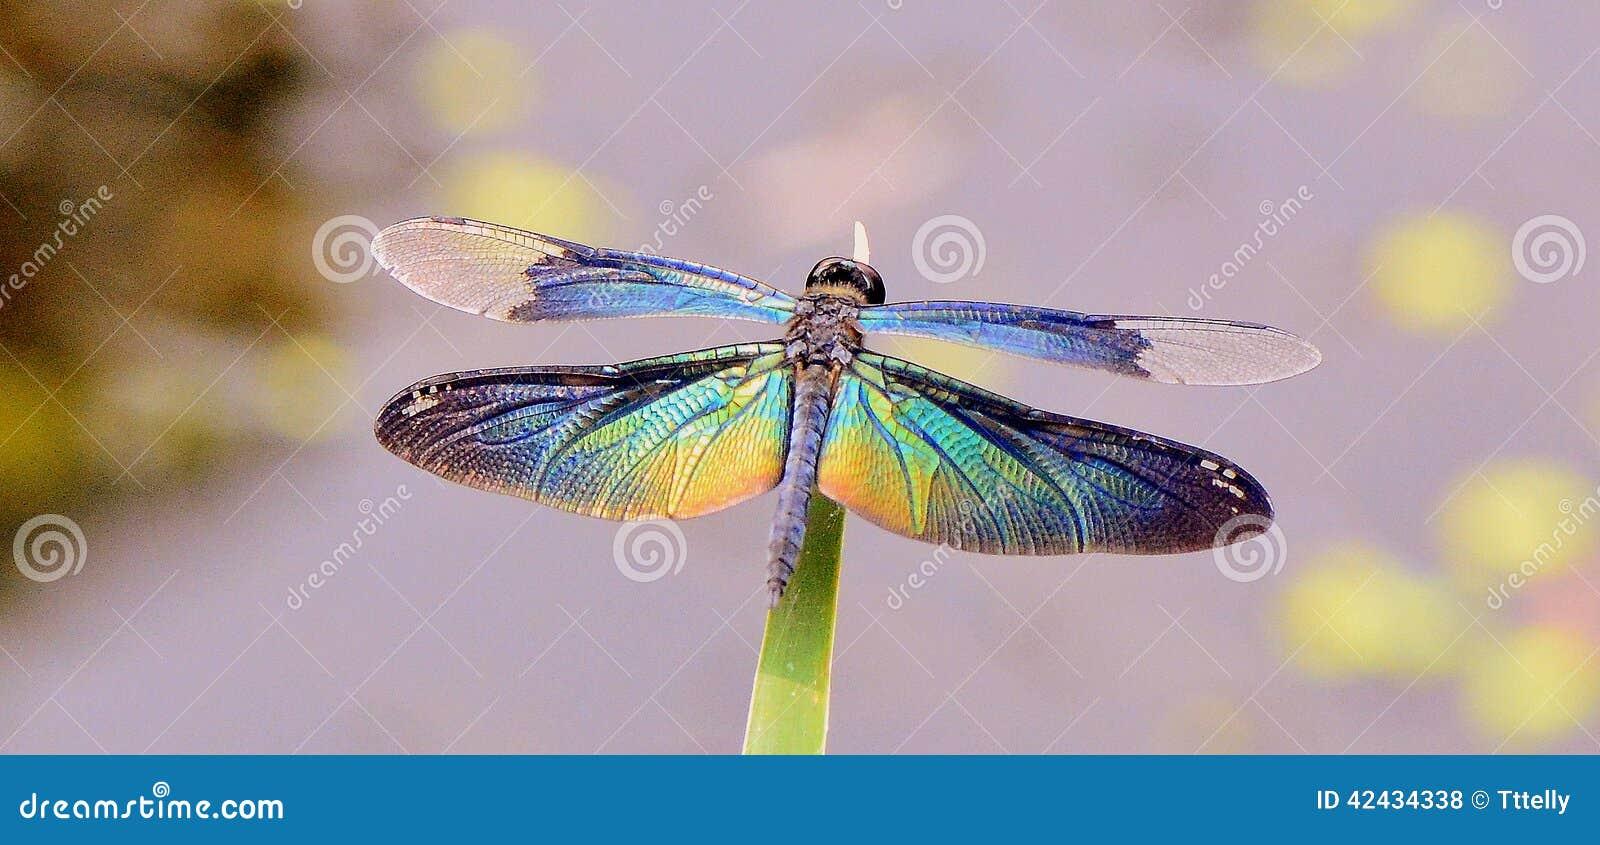 Dragon Fly Stock Photo - Image: 42434338